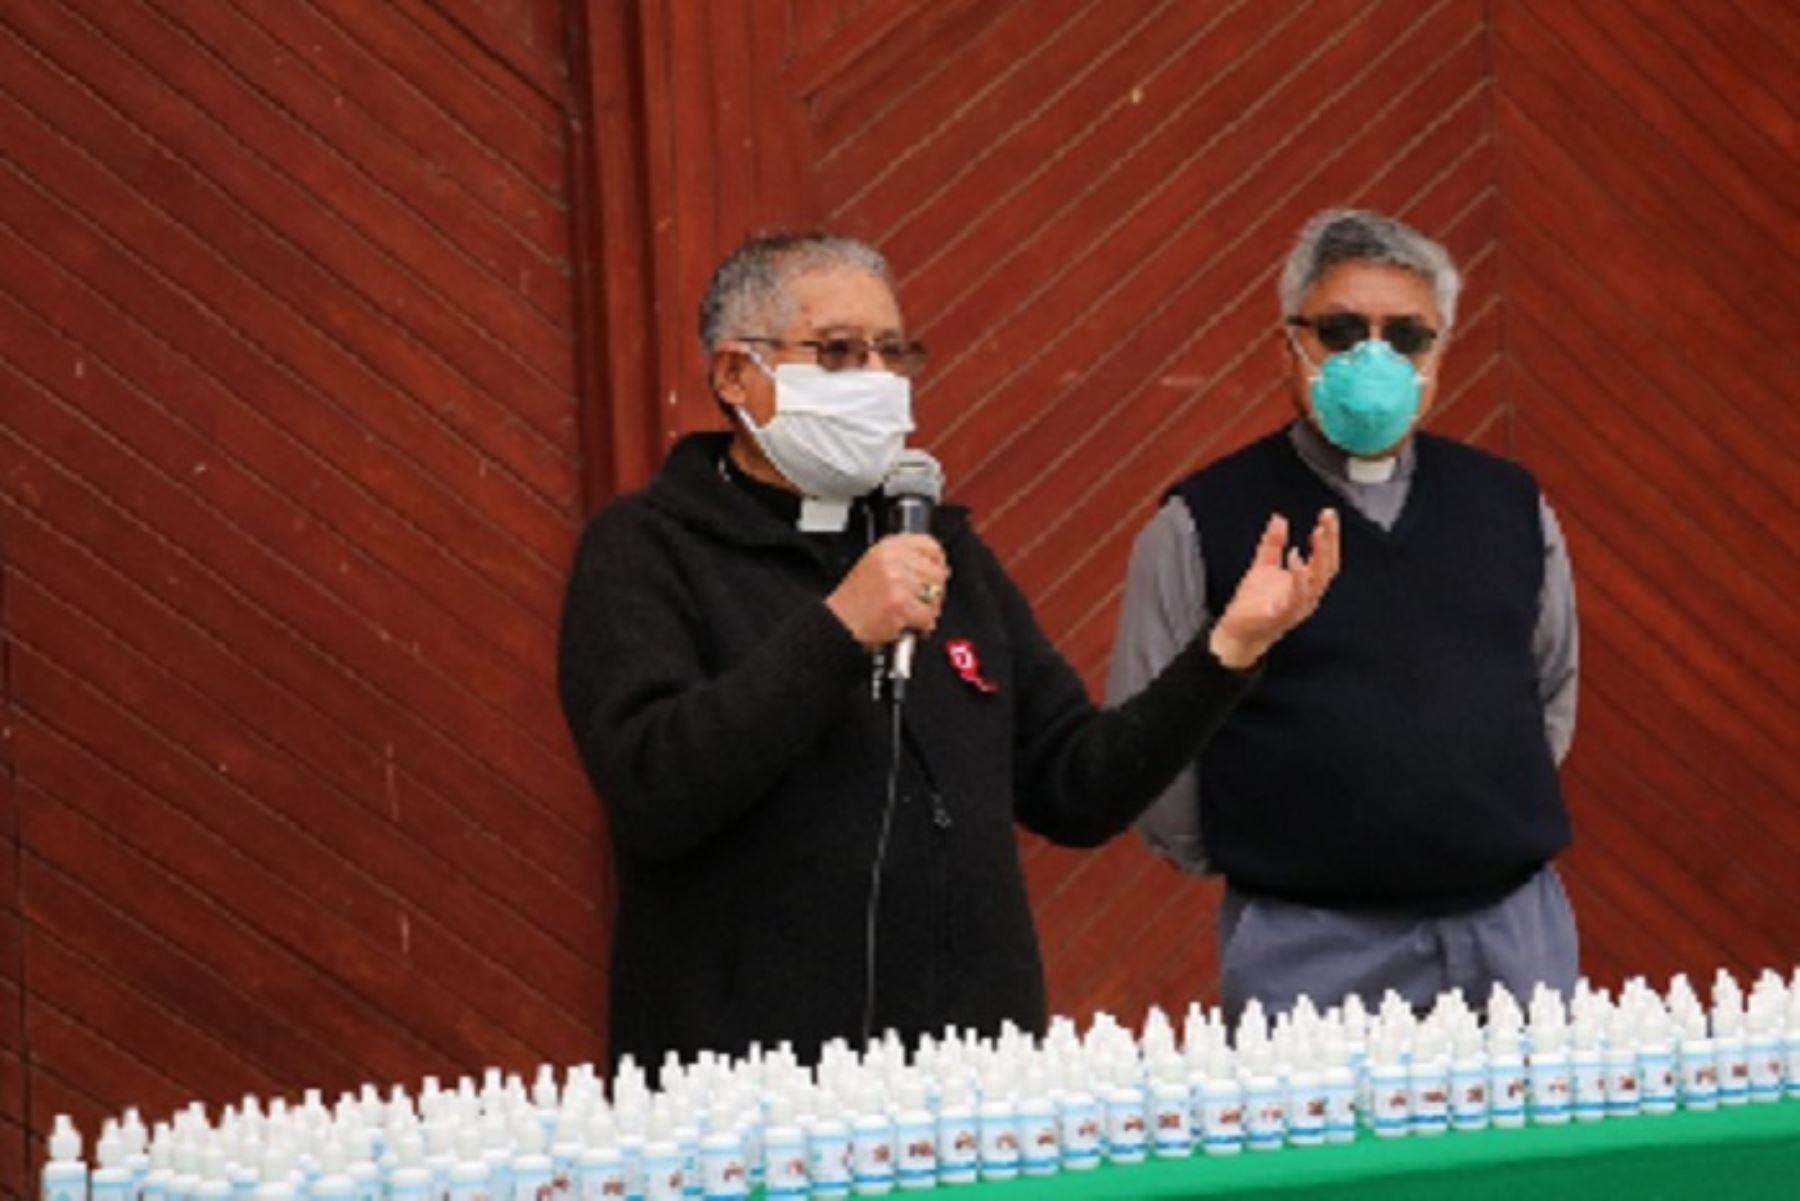 Coronavirus: Diócesis de Huaraz distribuye ivermectina para policías y población